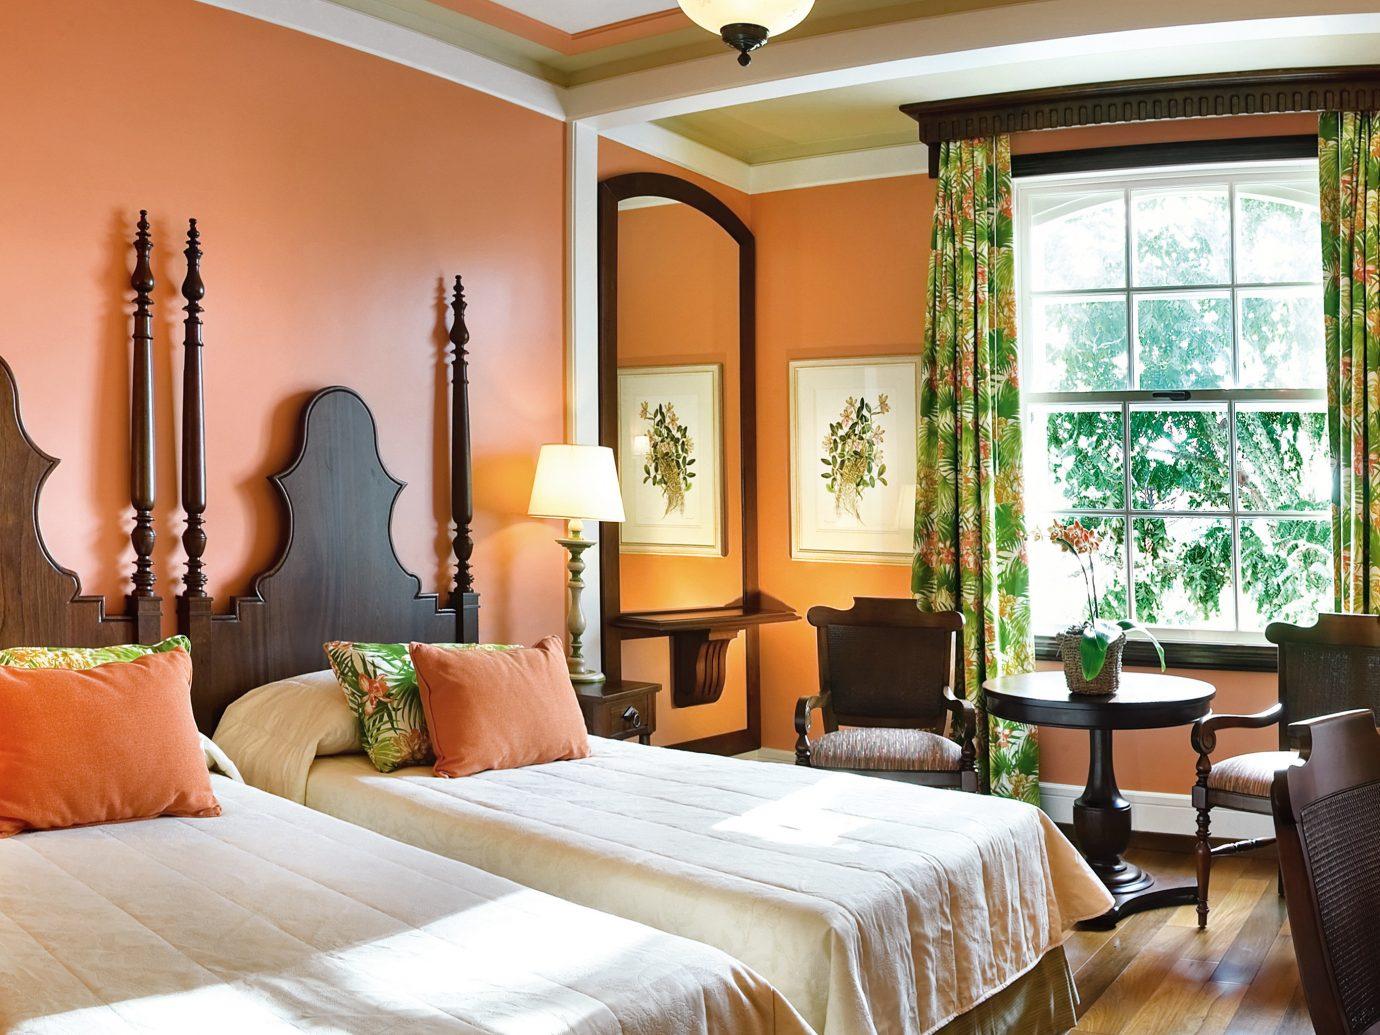 Bedroom At The Belmond Hotel Das Cataratas In Brazil, Iguacu National Park